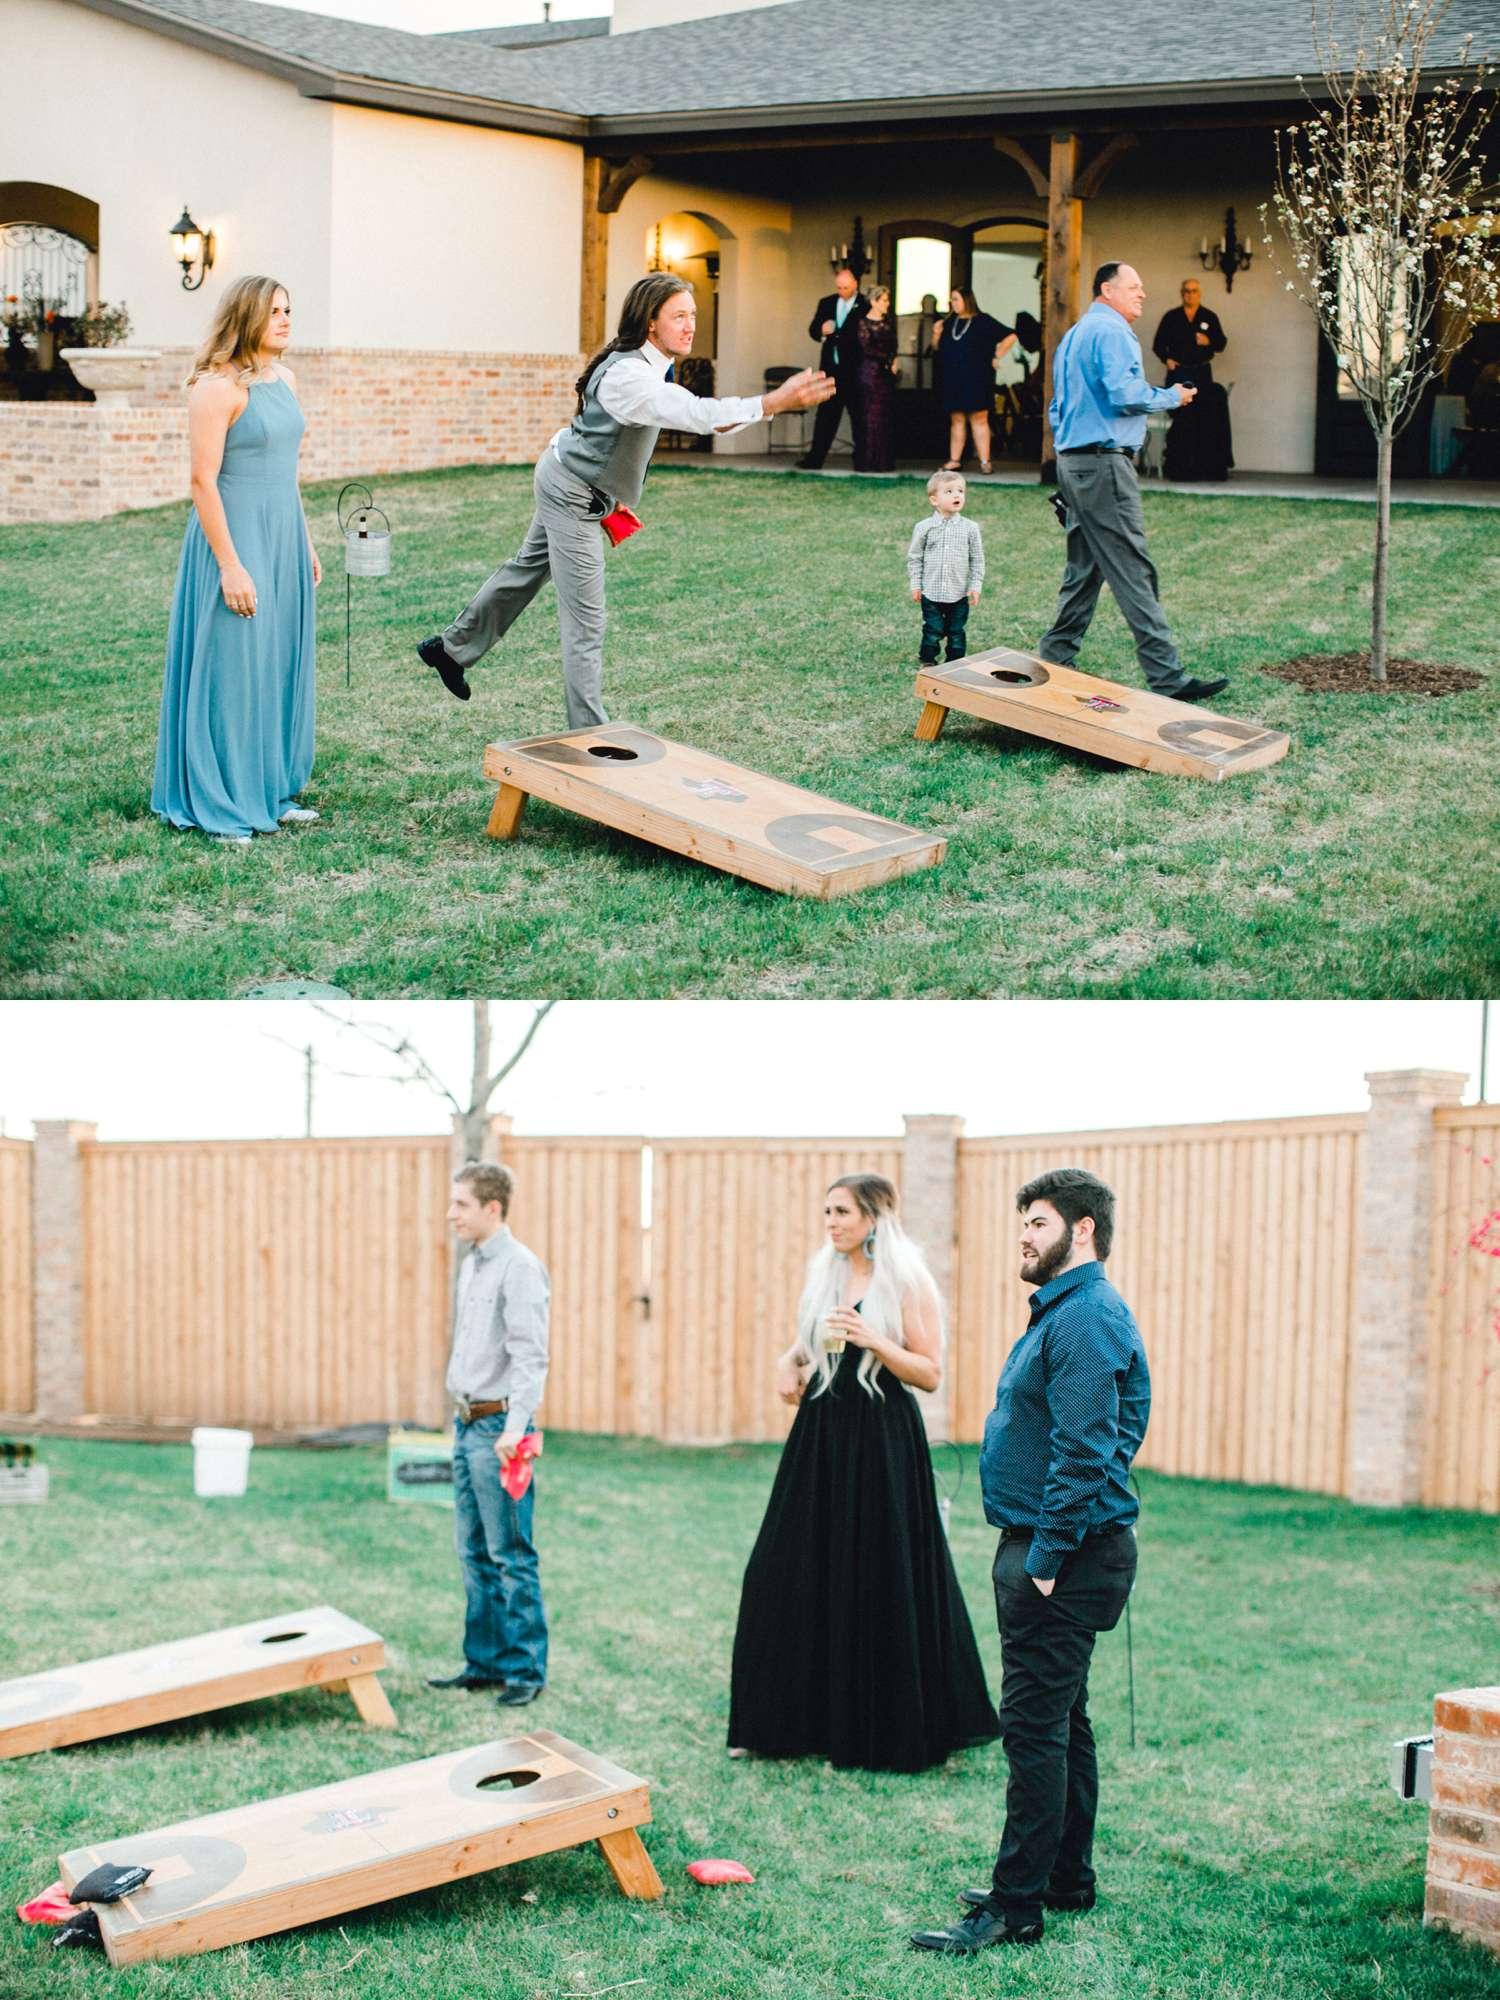 CASSIDY+AND+HARLEY+BRADLEY+EBERLEY+BROOKS+CHAPEL+LUBBOCK+WEDDING+PHOTOGRAPHER+ALLEEJ_0133.jpg